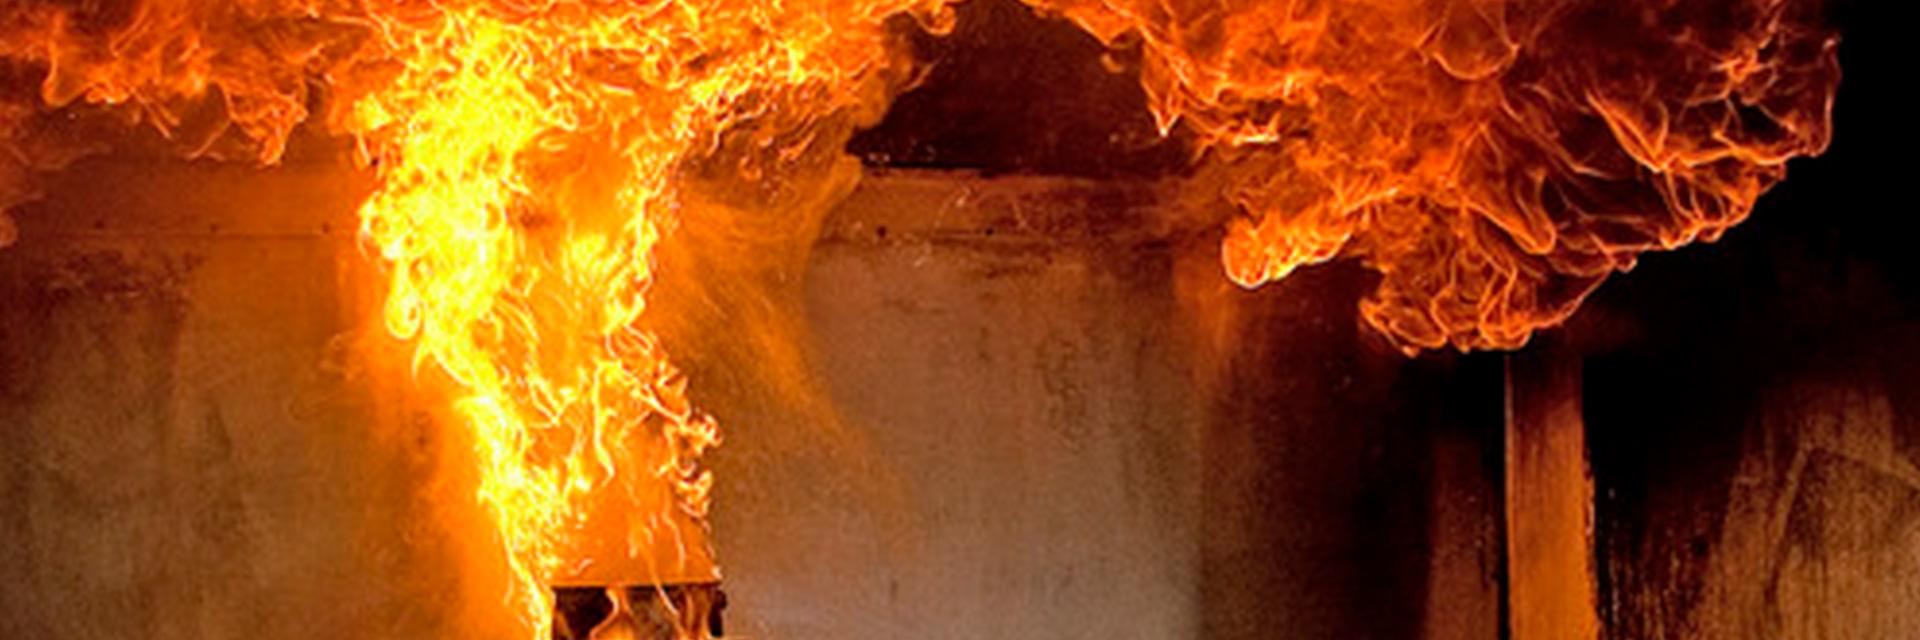 Fire Supression Systems